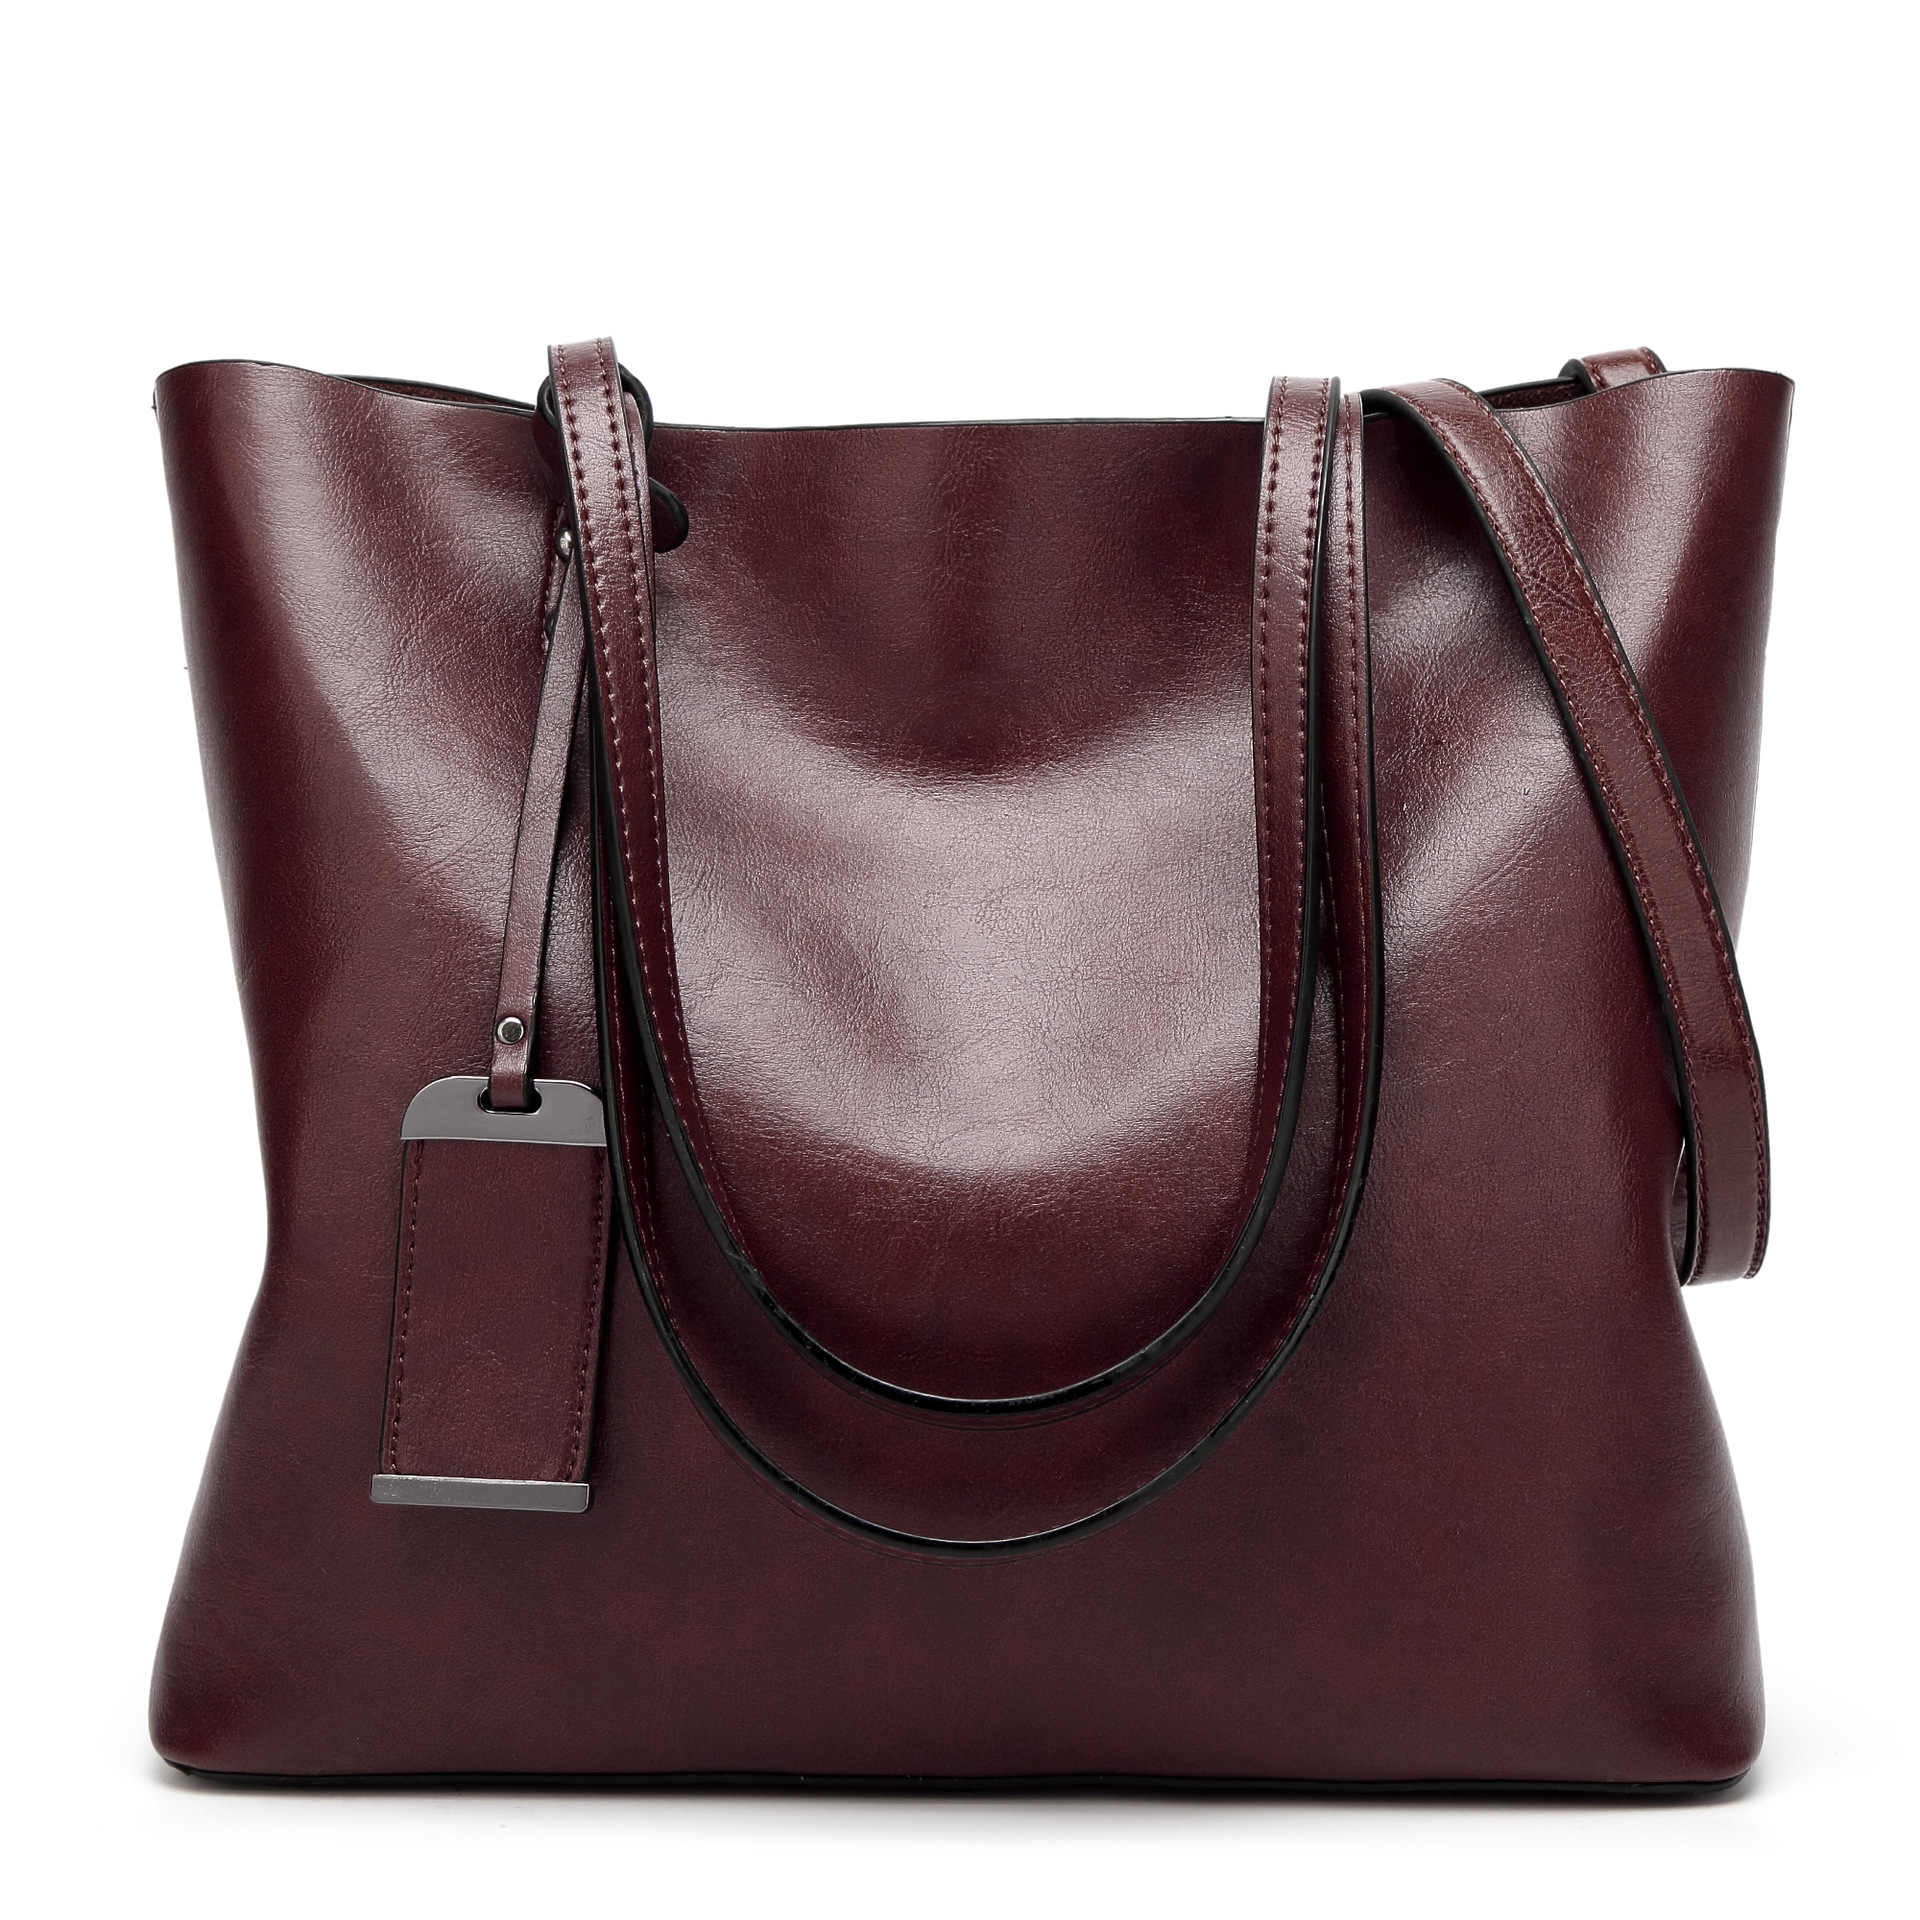 Femme sac a principal Bolsas De Luxo Mulheres Sacos de Designer de Mulheres de Couro Macio Saco de Ombro das Senhoras Tote Borla Bolsa de Moda c1079